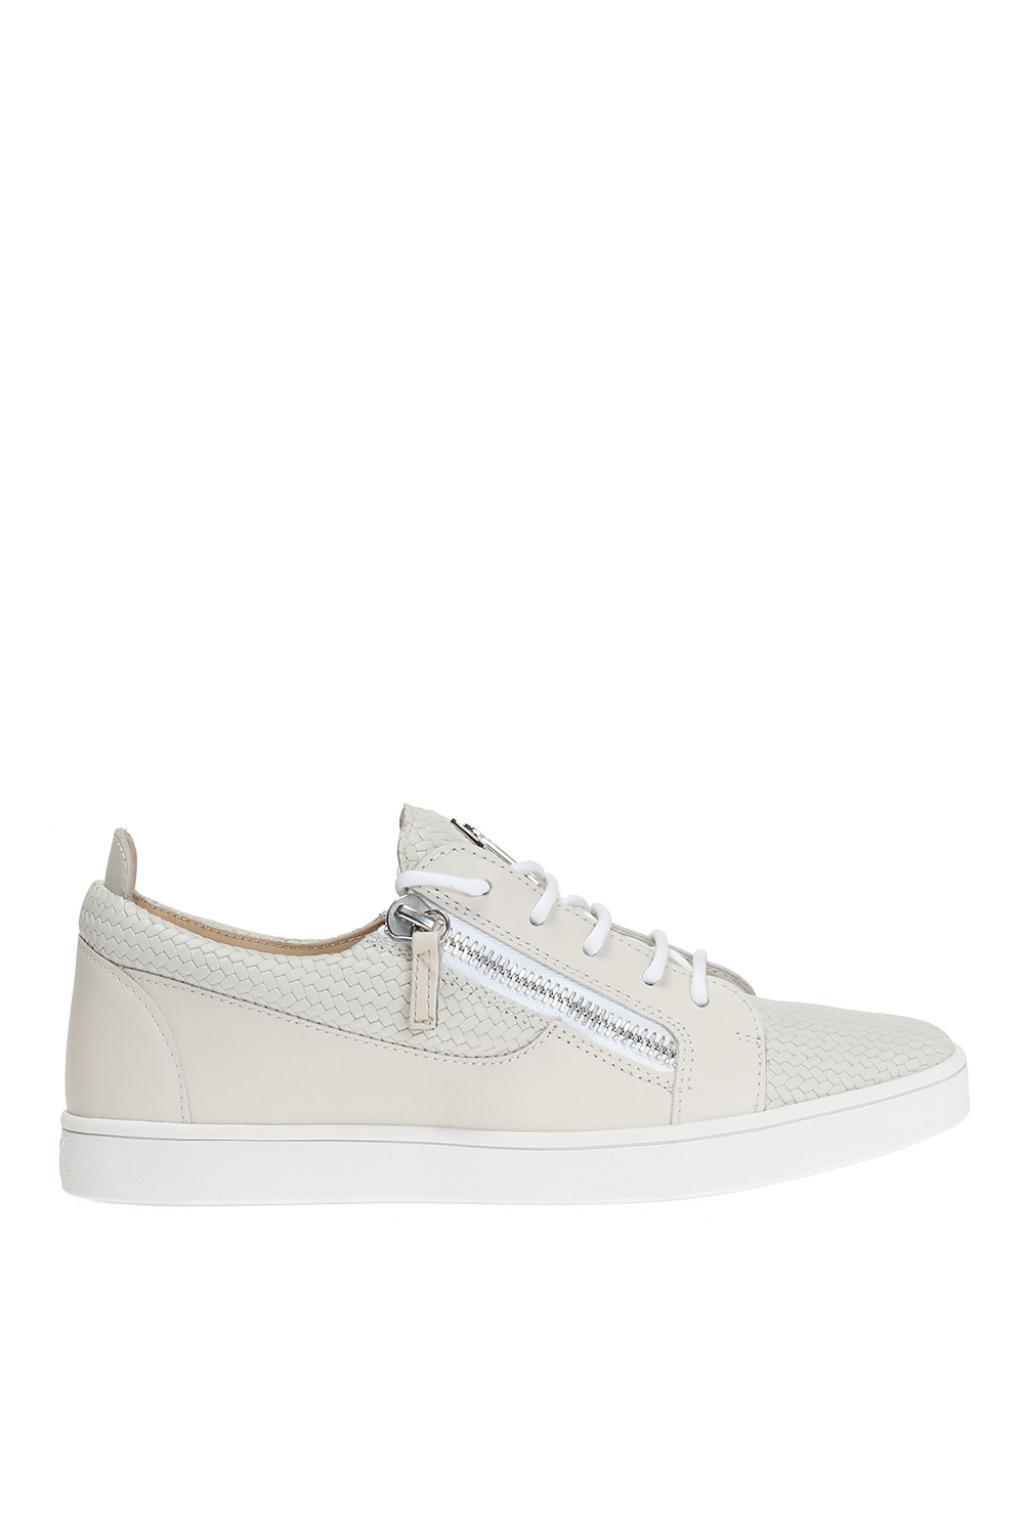 Dilan sneakers - Grey Giuseppe Zanotti Amazon FCEhW